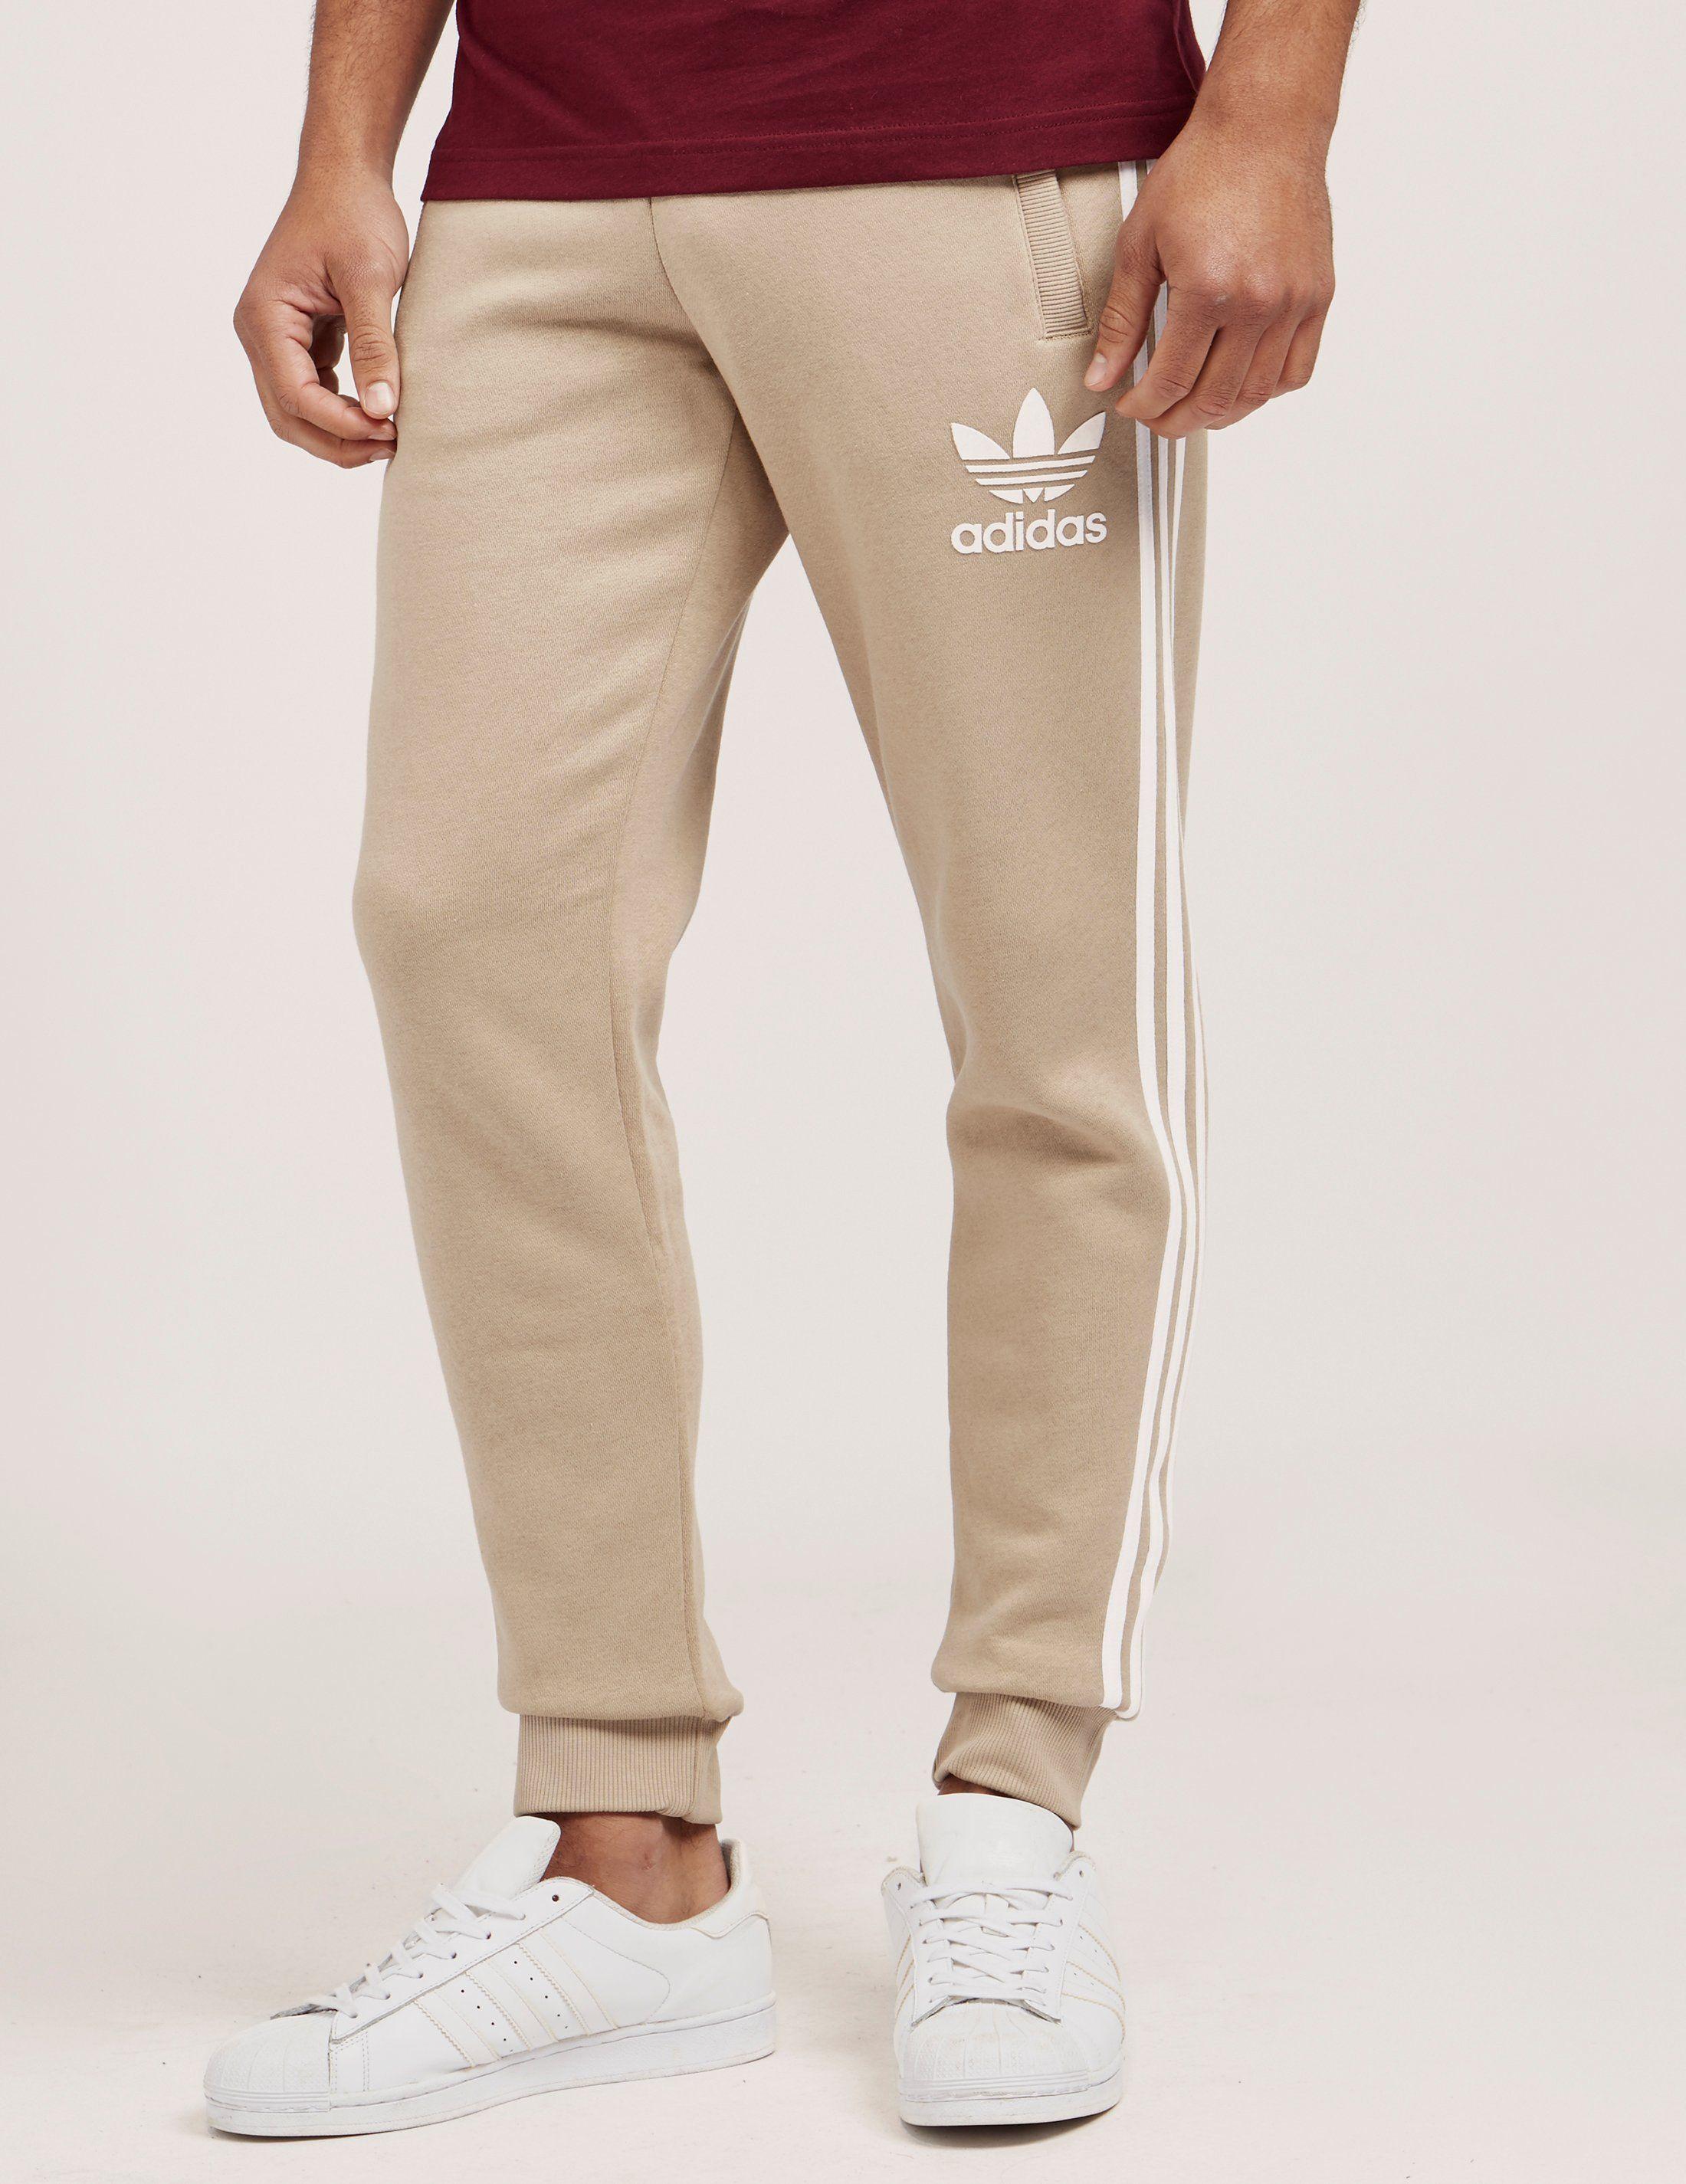 Adidas Originals California esposado pista pantalones tejidos